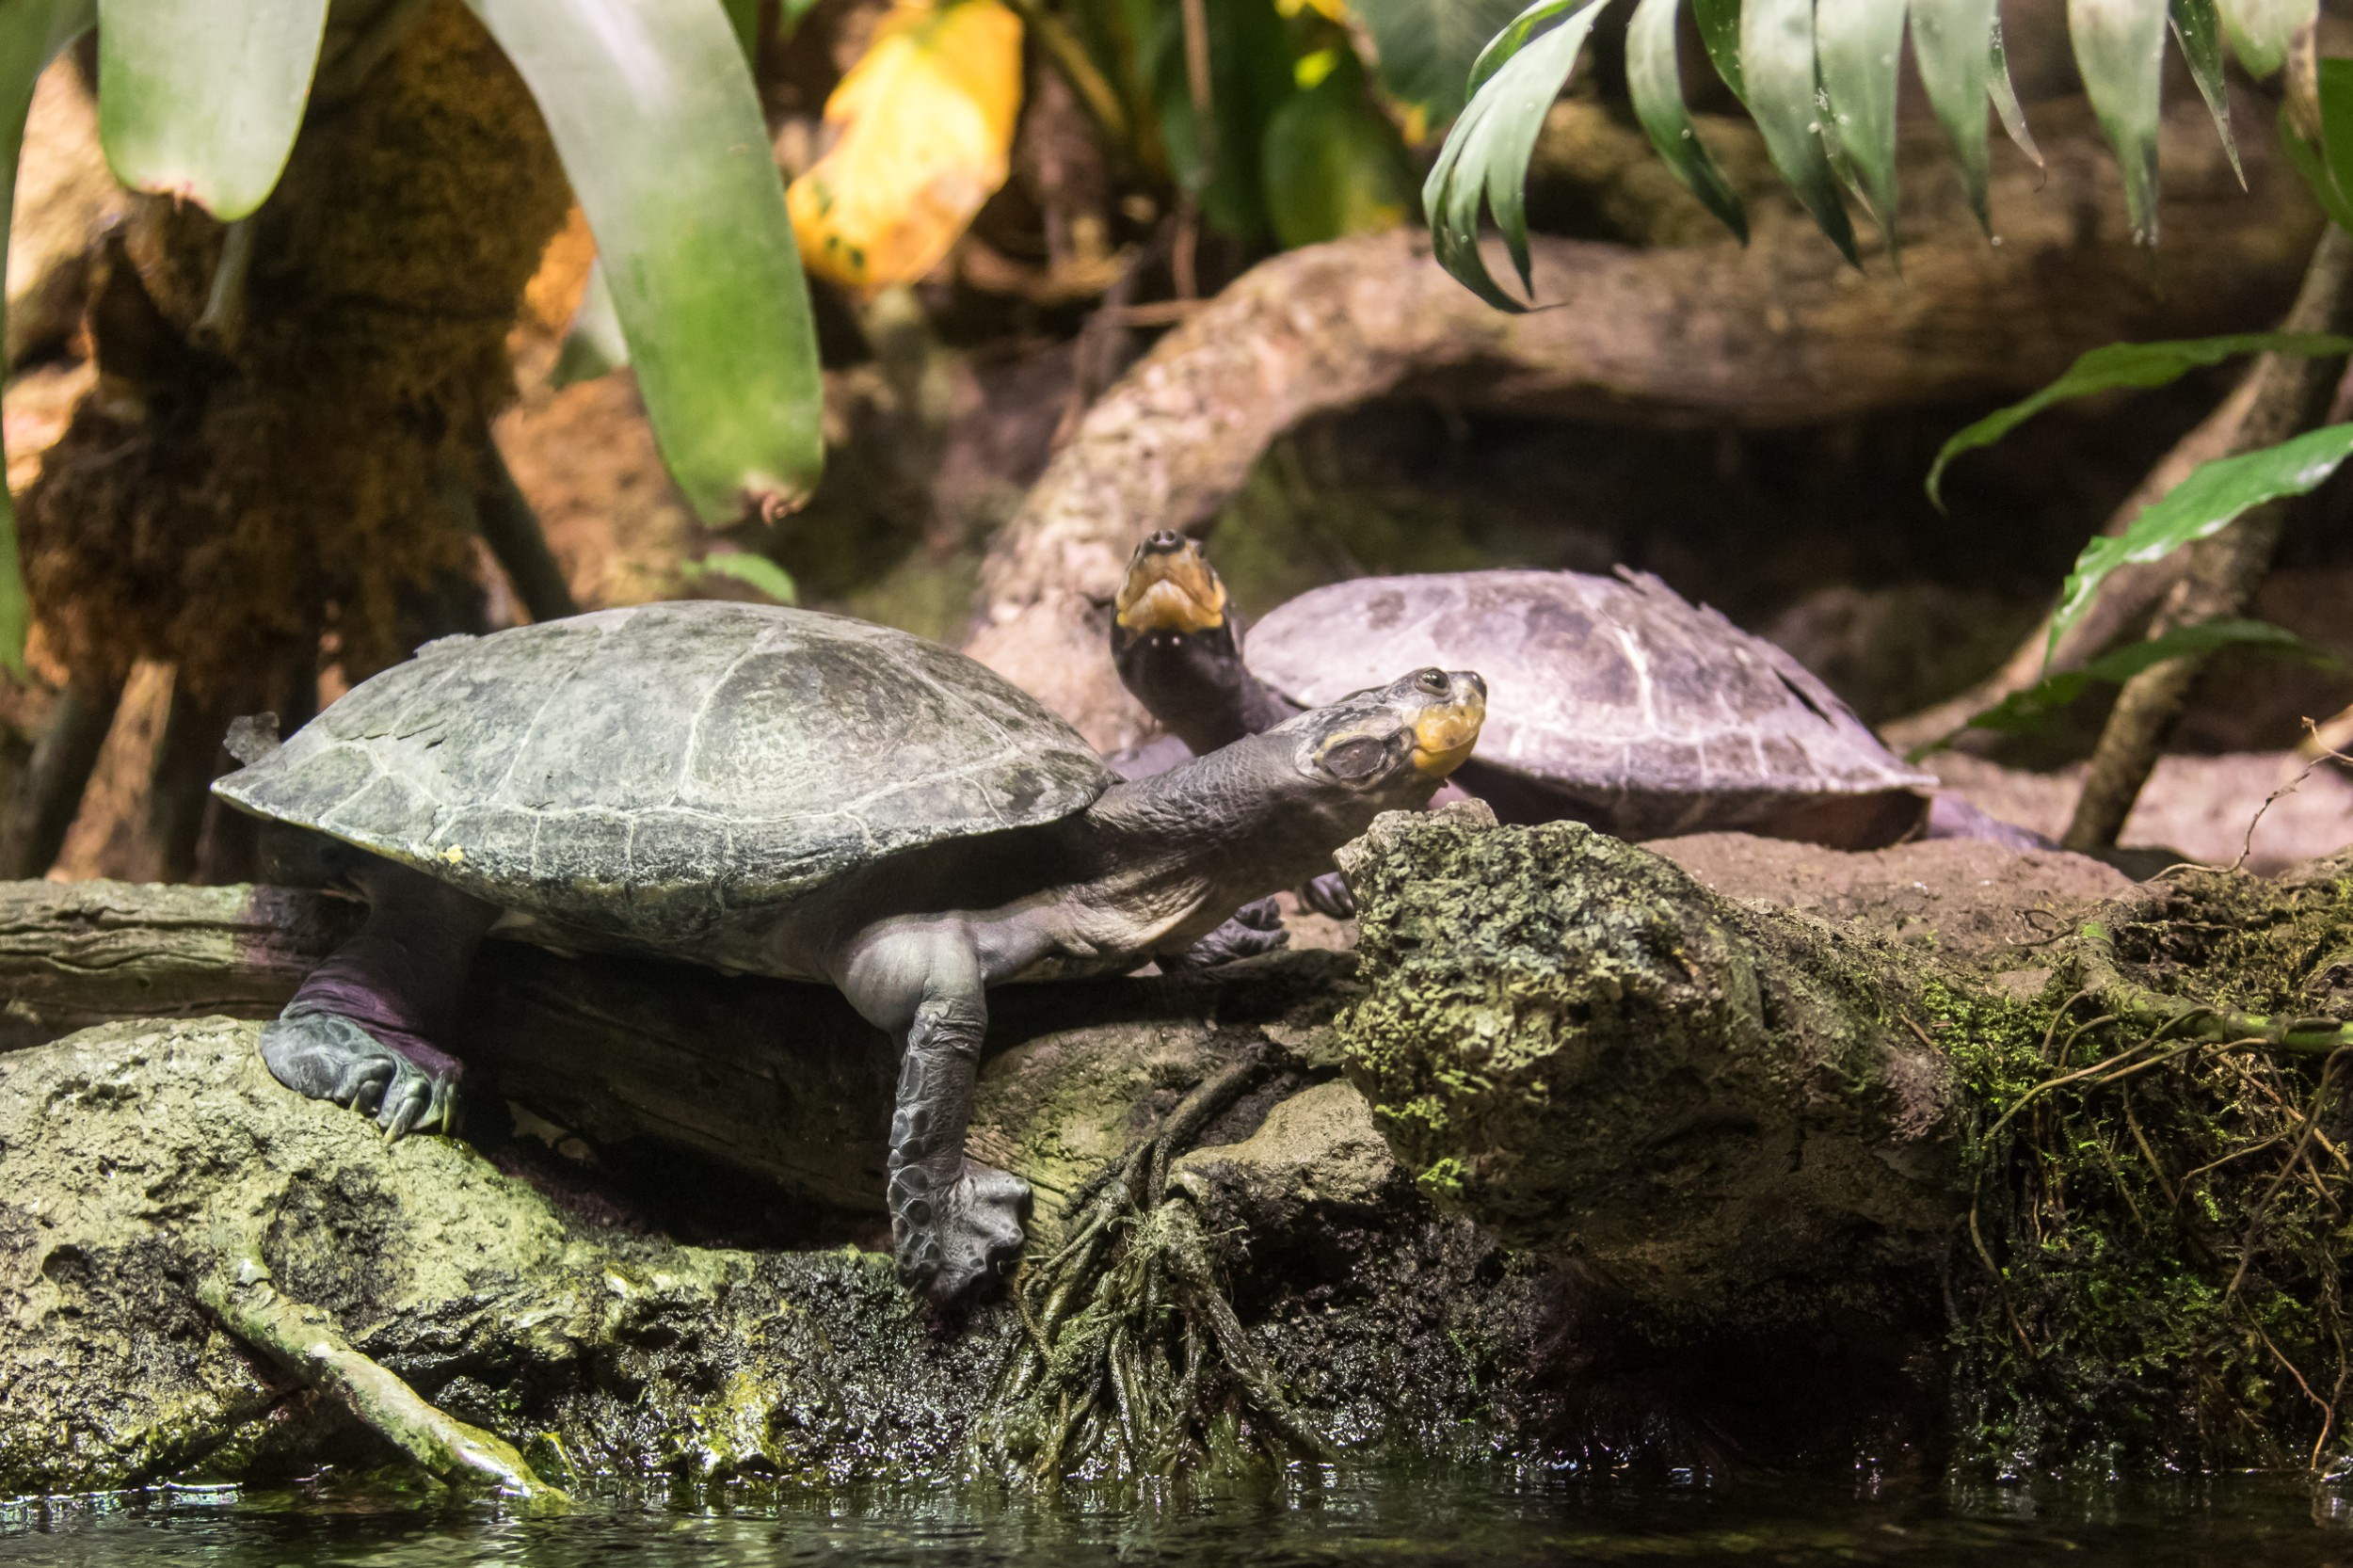 tartaruga da amazônia animais infoescola